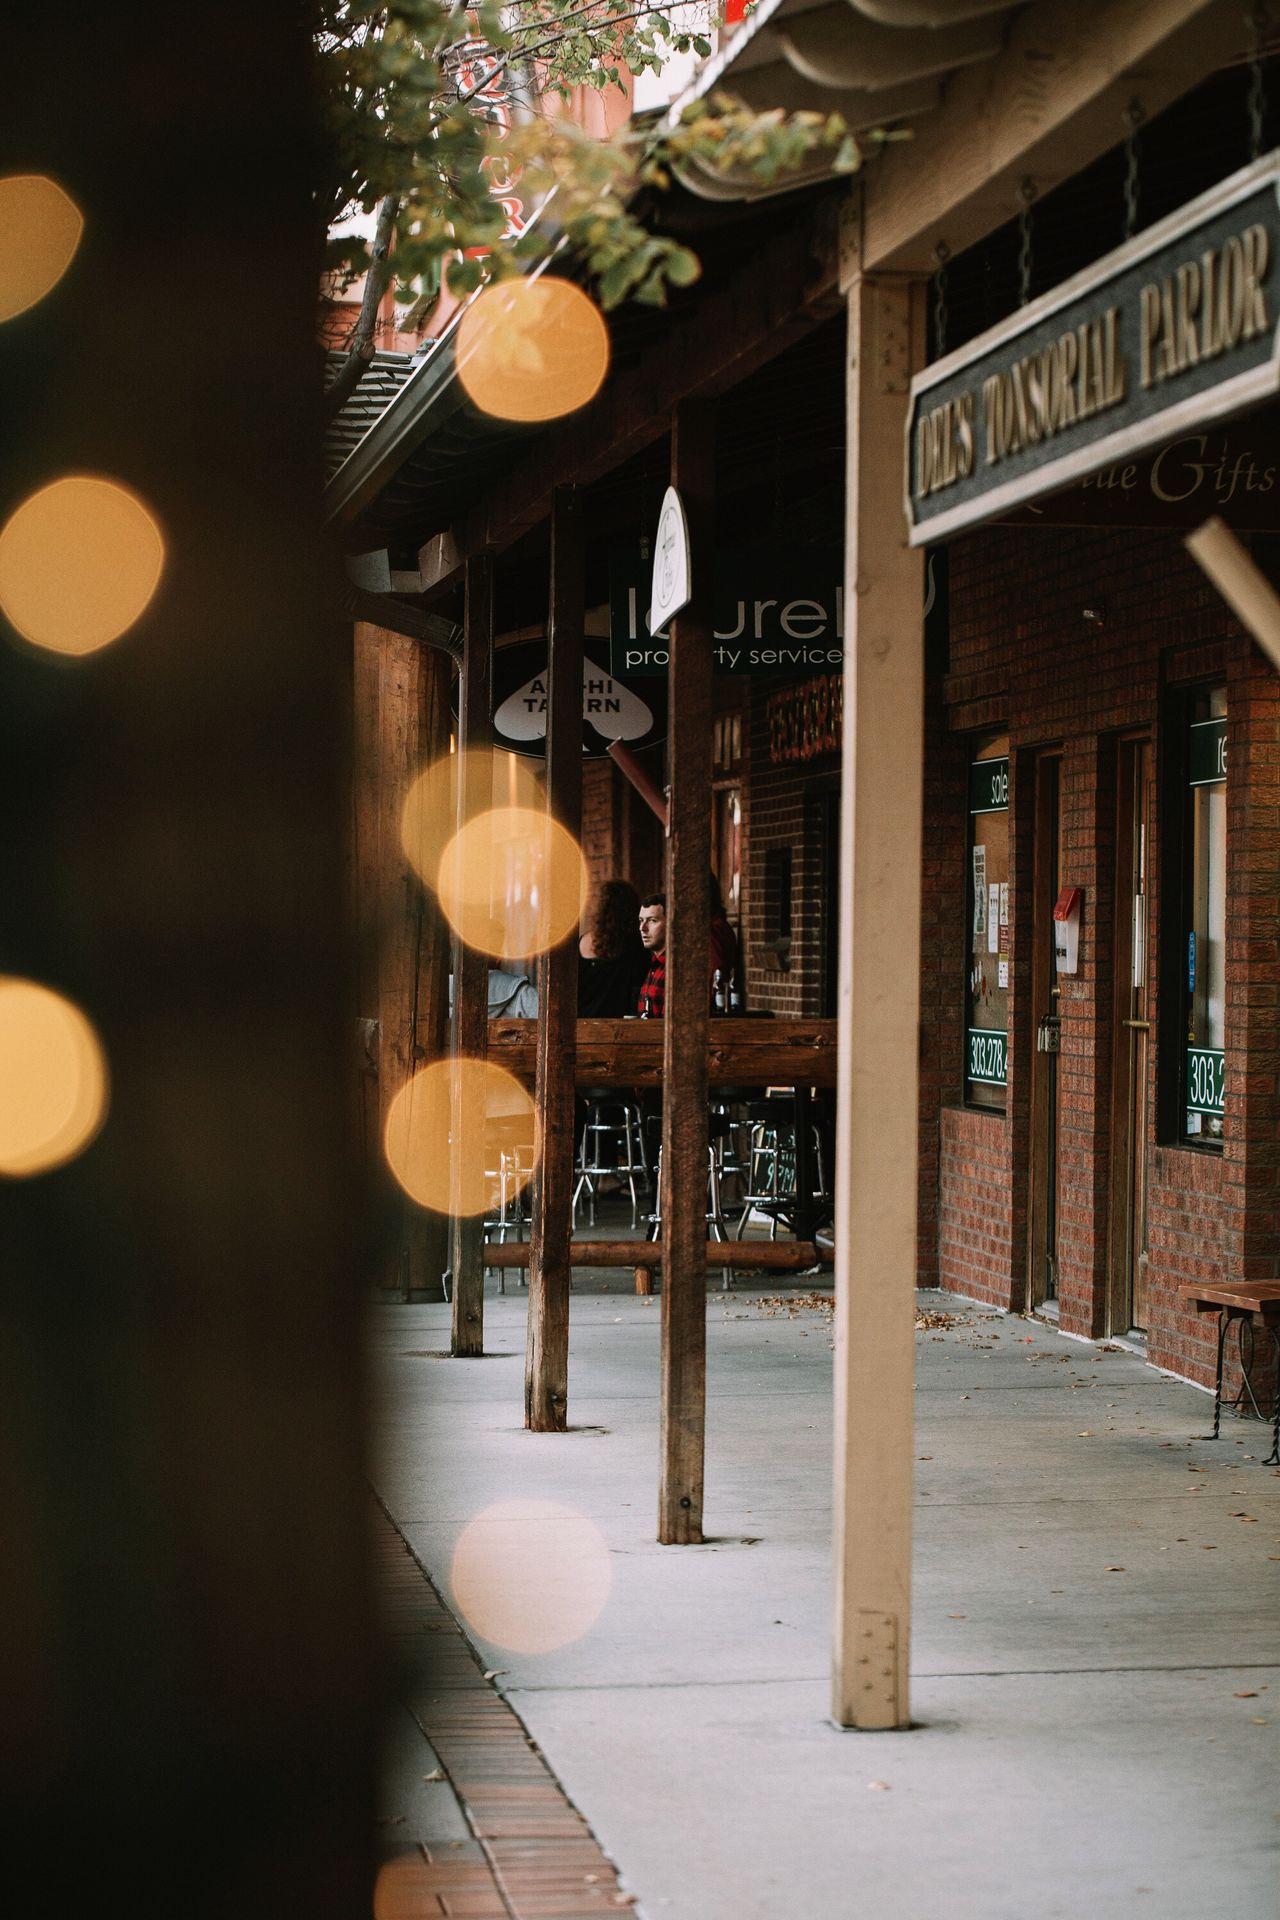 Main Street Golden Shops bar - drink establishment Boutique Shops shops buildings Golden Colorado shopstreet boutique shops mainstreet business